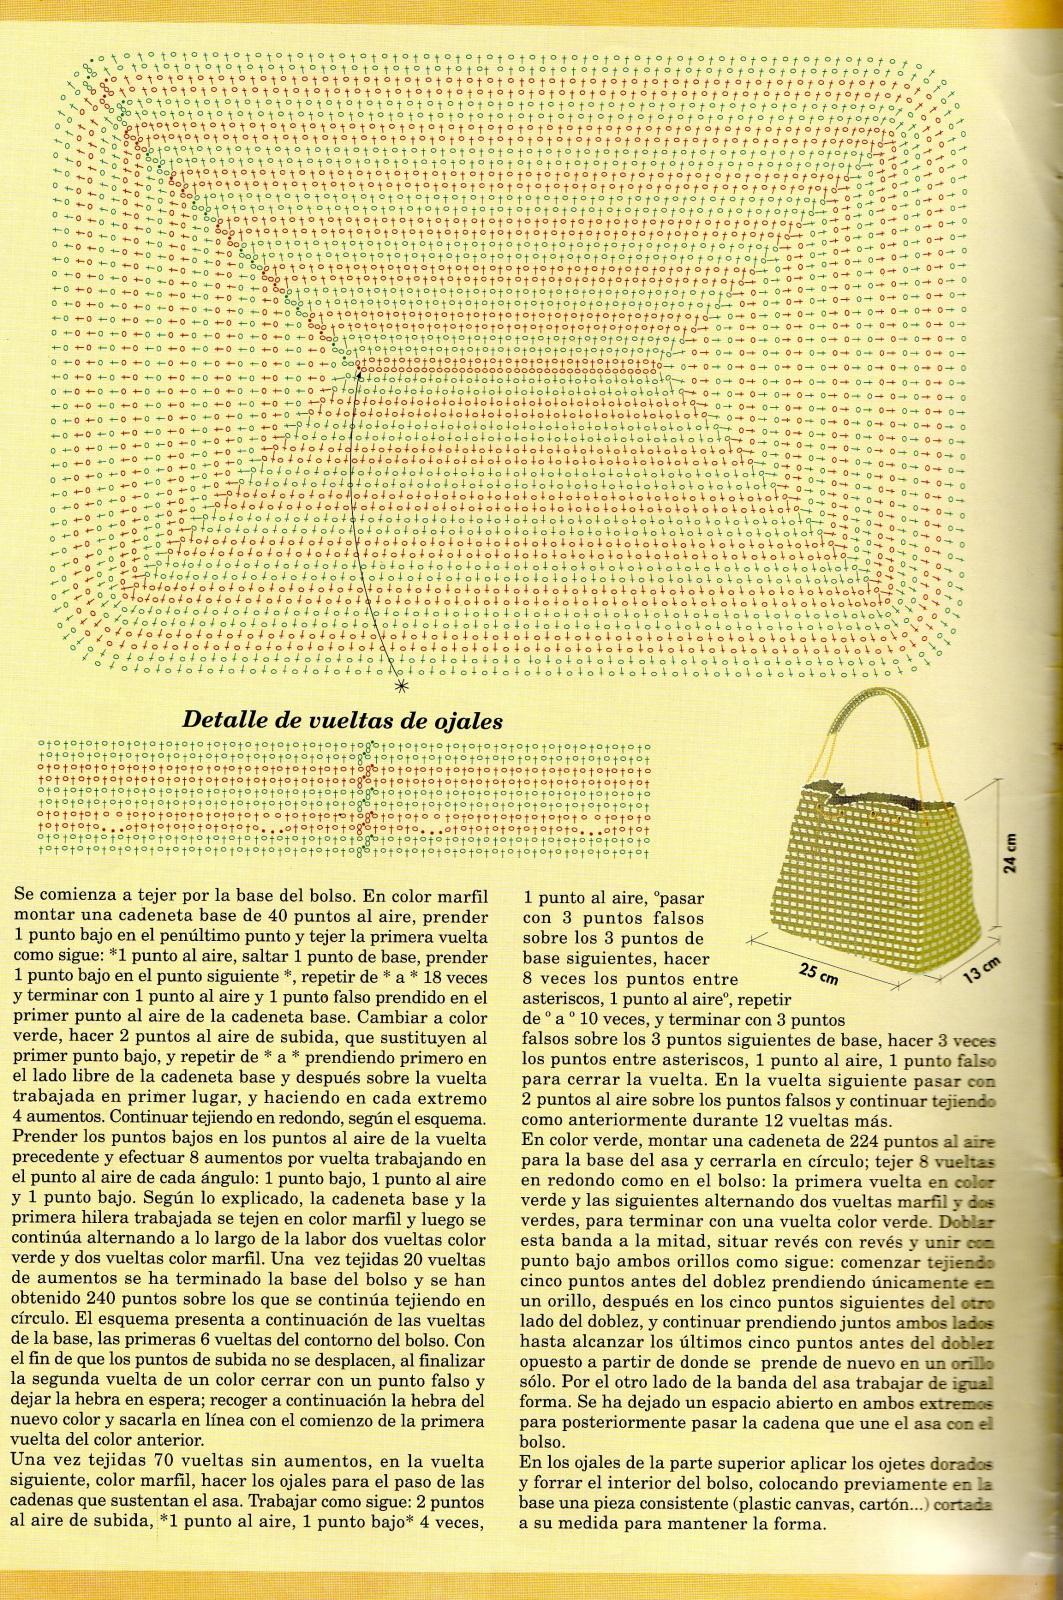 patrones - patrones de bolsos 1ze9ijl